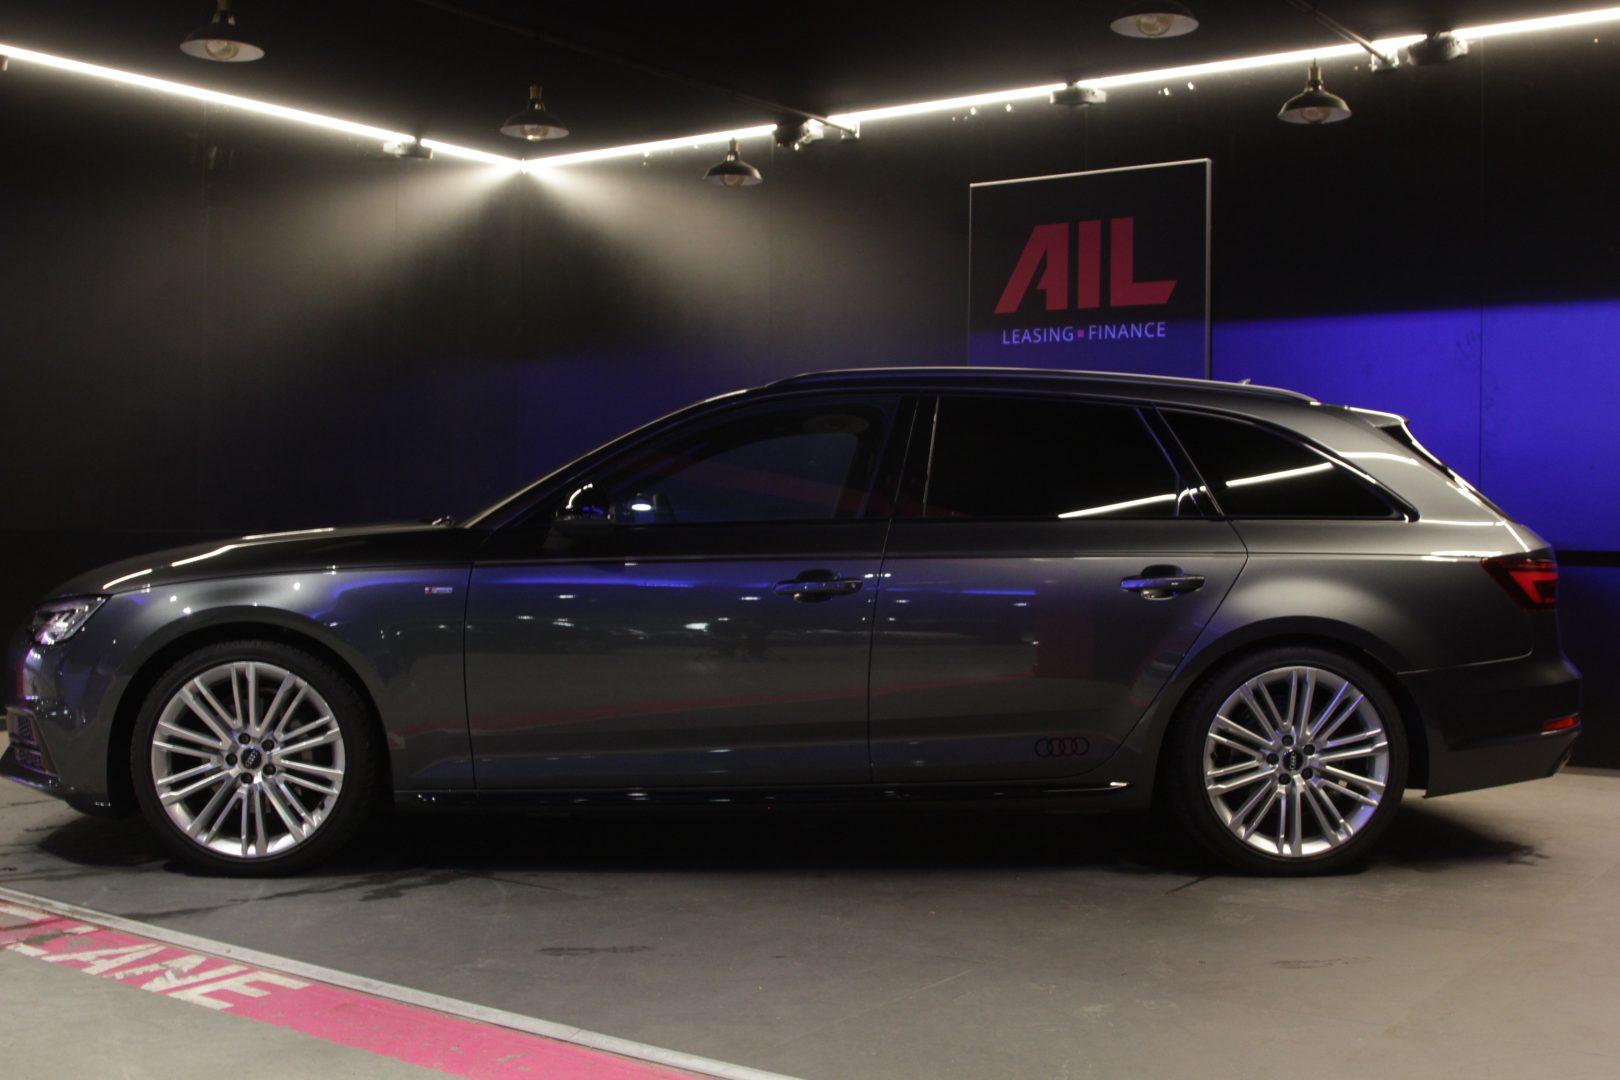 AIL Audi A4 Avant S line Sport / Plus quattro 3.0 TDI 7